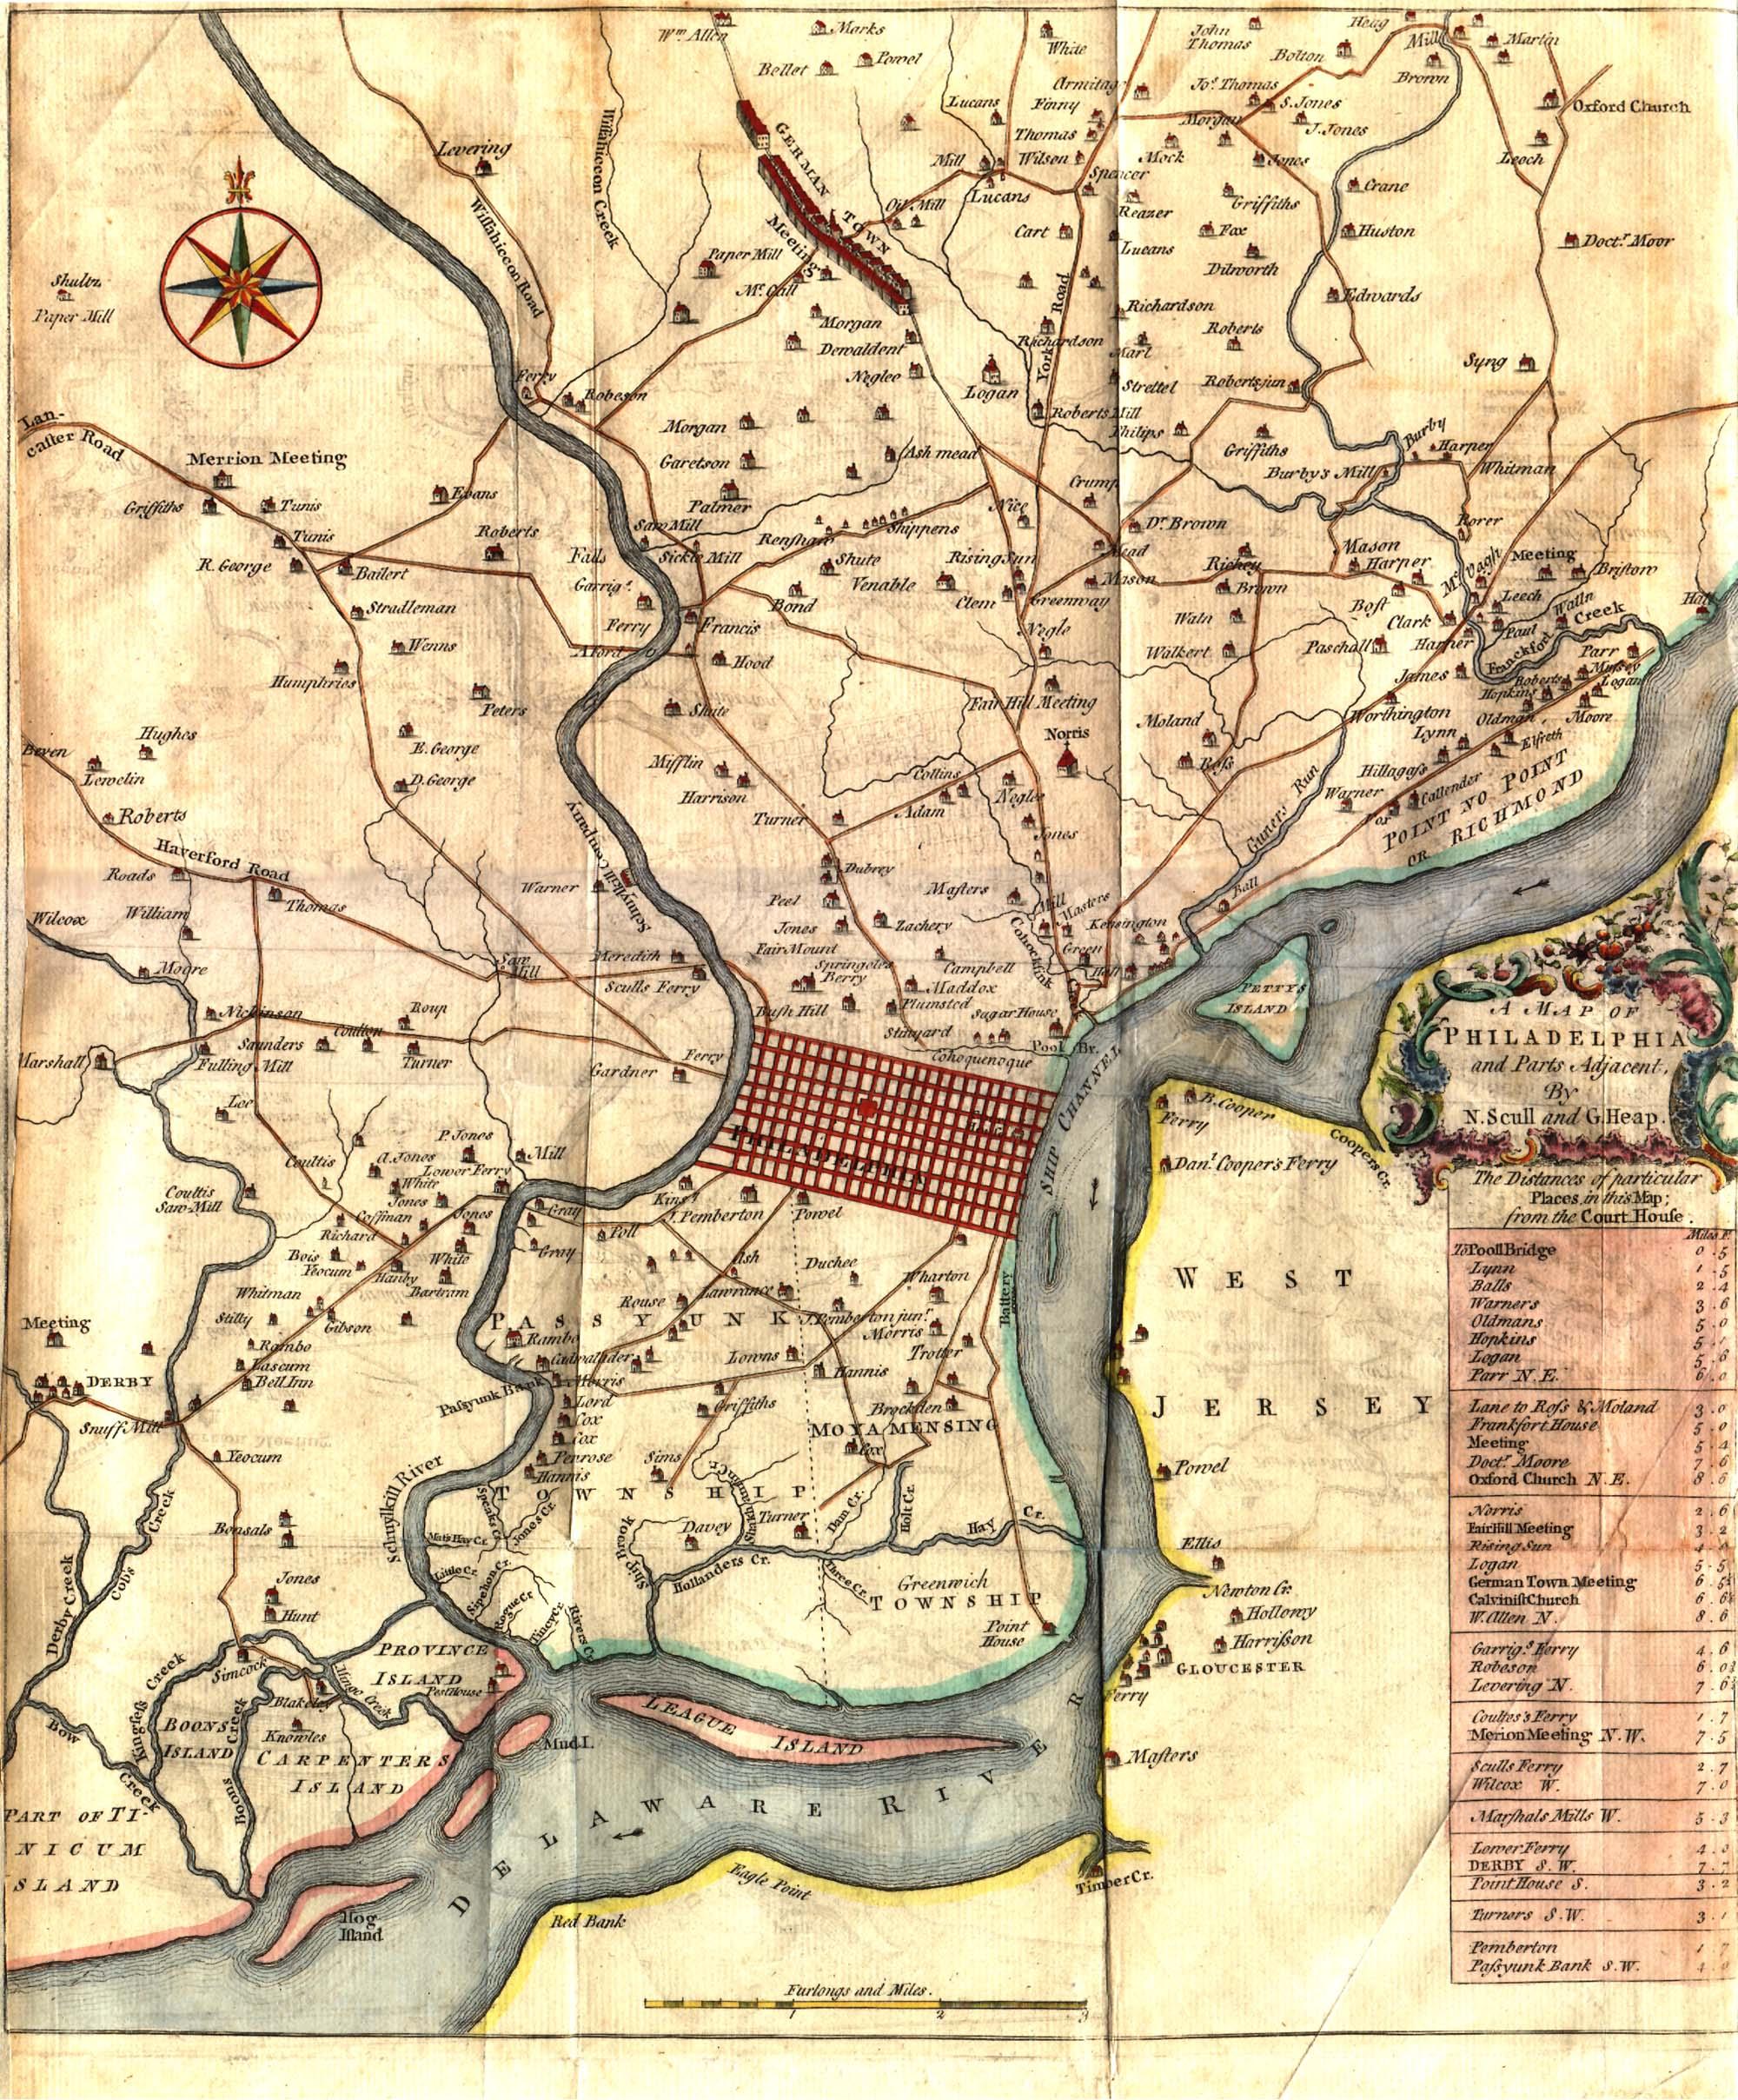 PAgenealogy.net : Pennsylvania Historical Maps